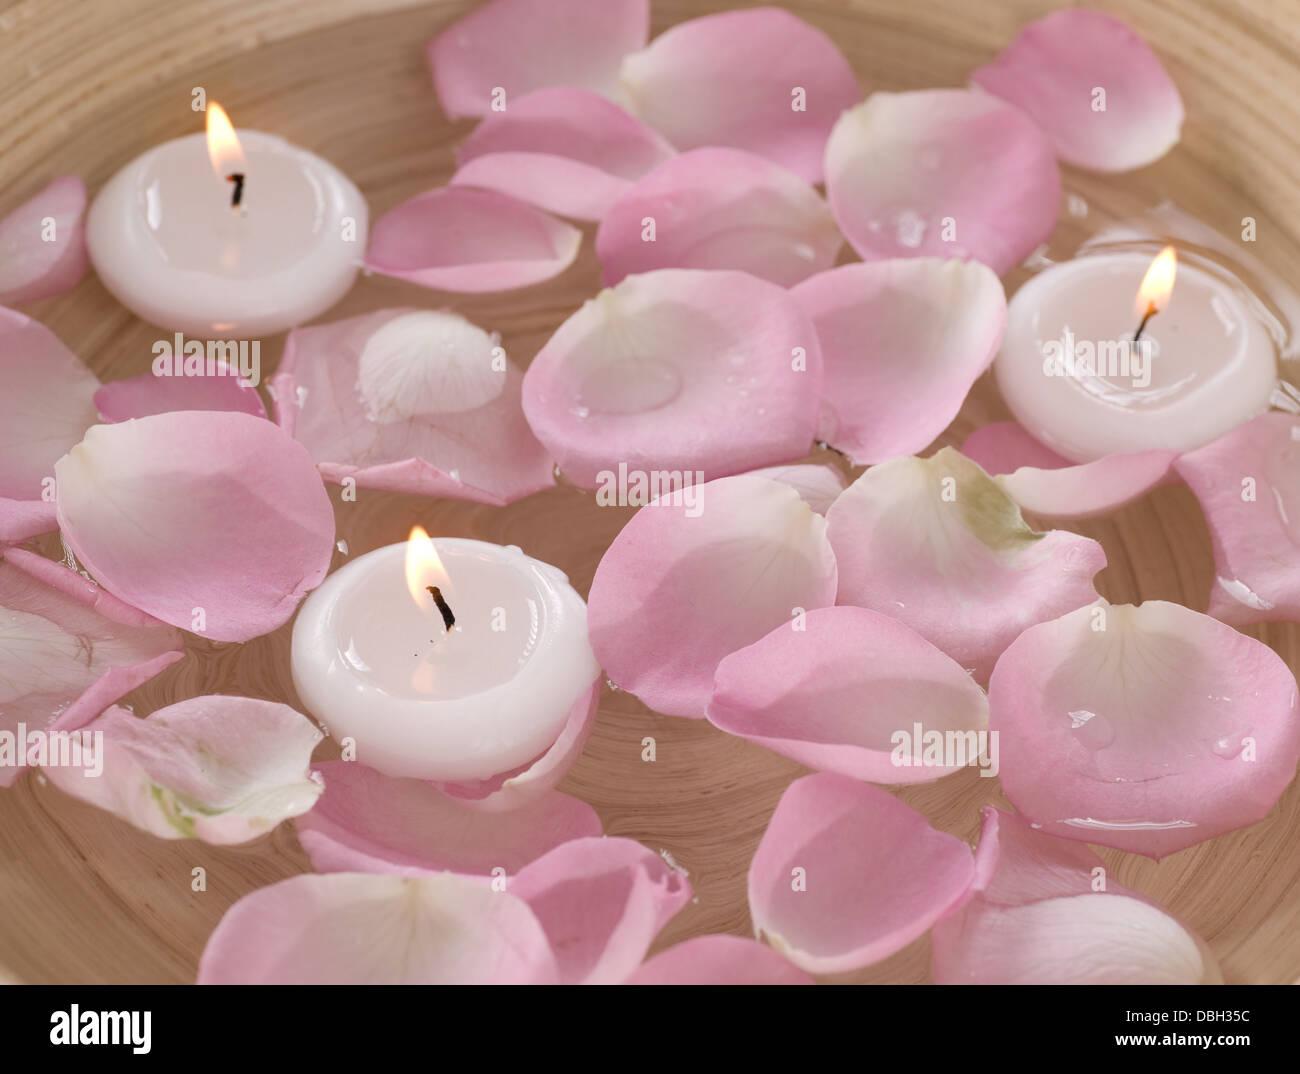 Spa candele galleggianti e petali di rosa in acqua foto immagine